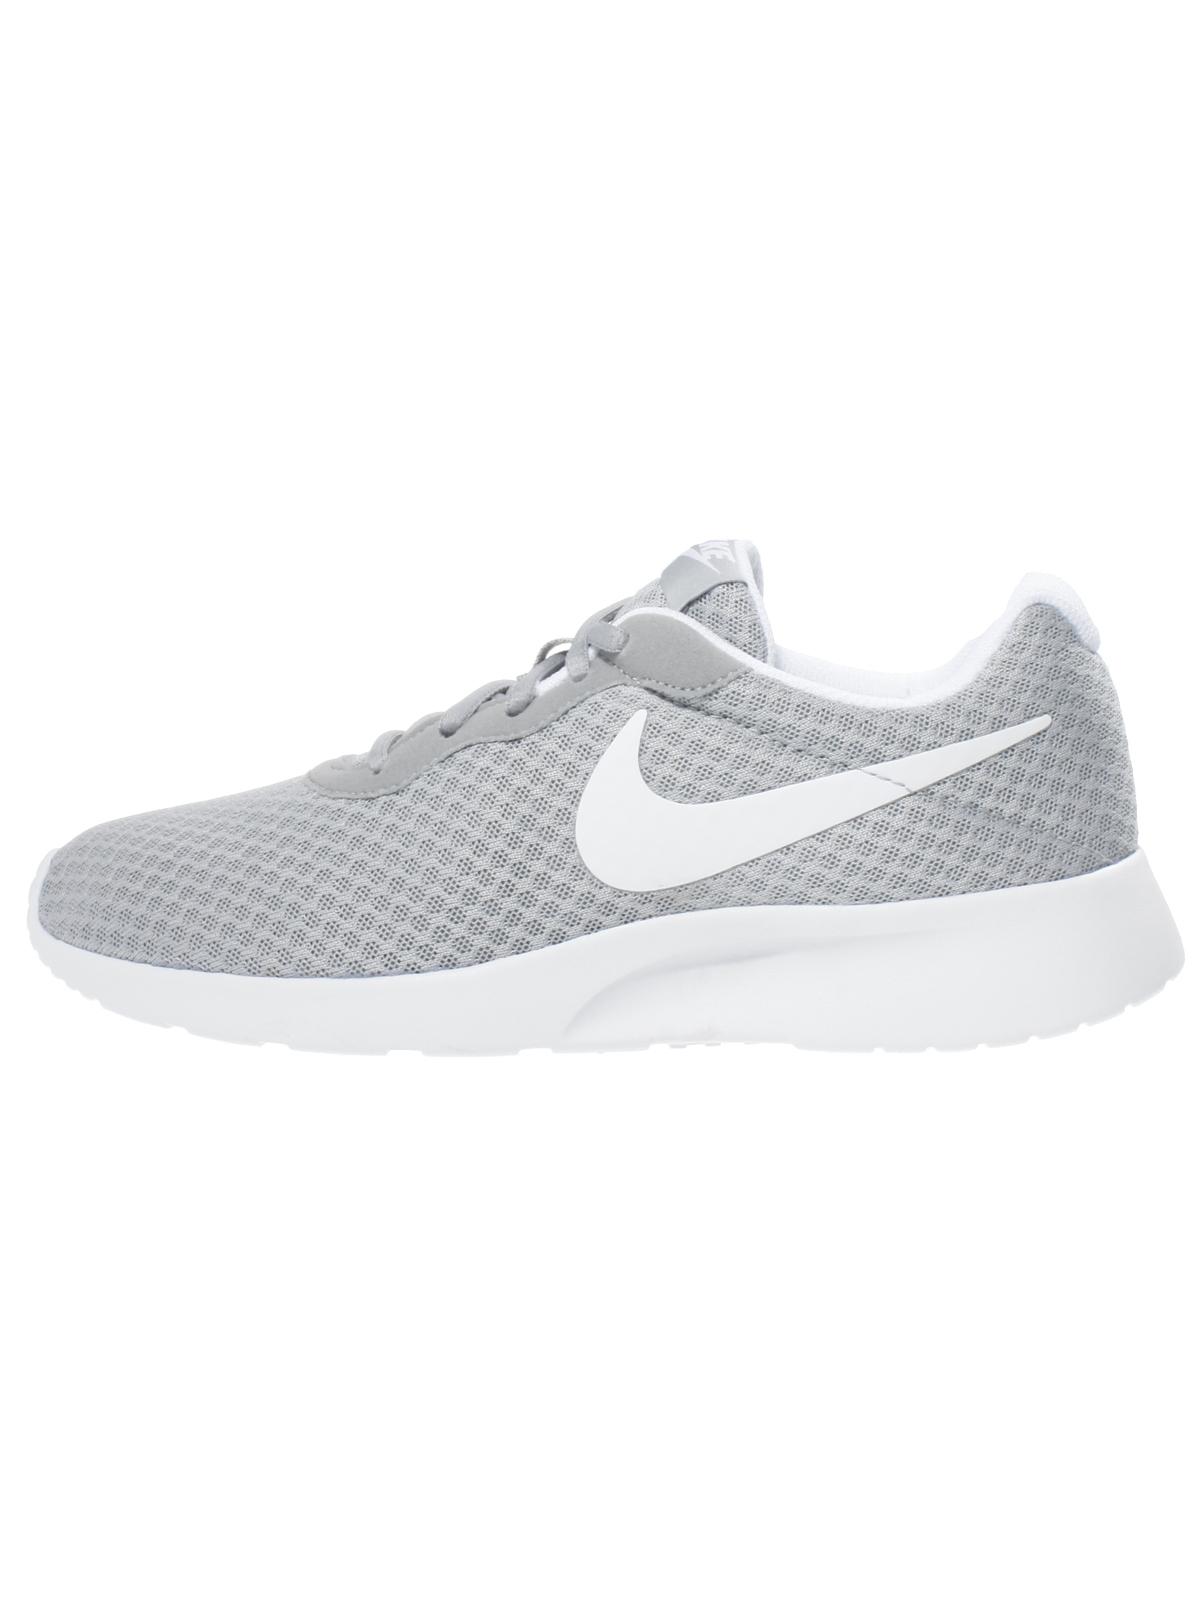 010 Grau 812655 Damen Schuhe Nike Sneaker Tanjun Sport Freizeit xrdCBoe